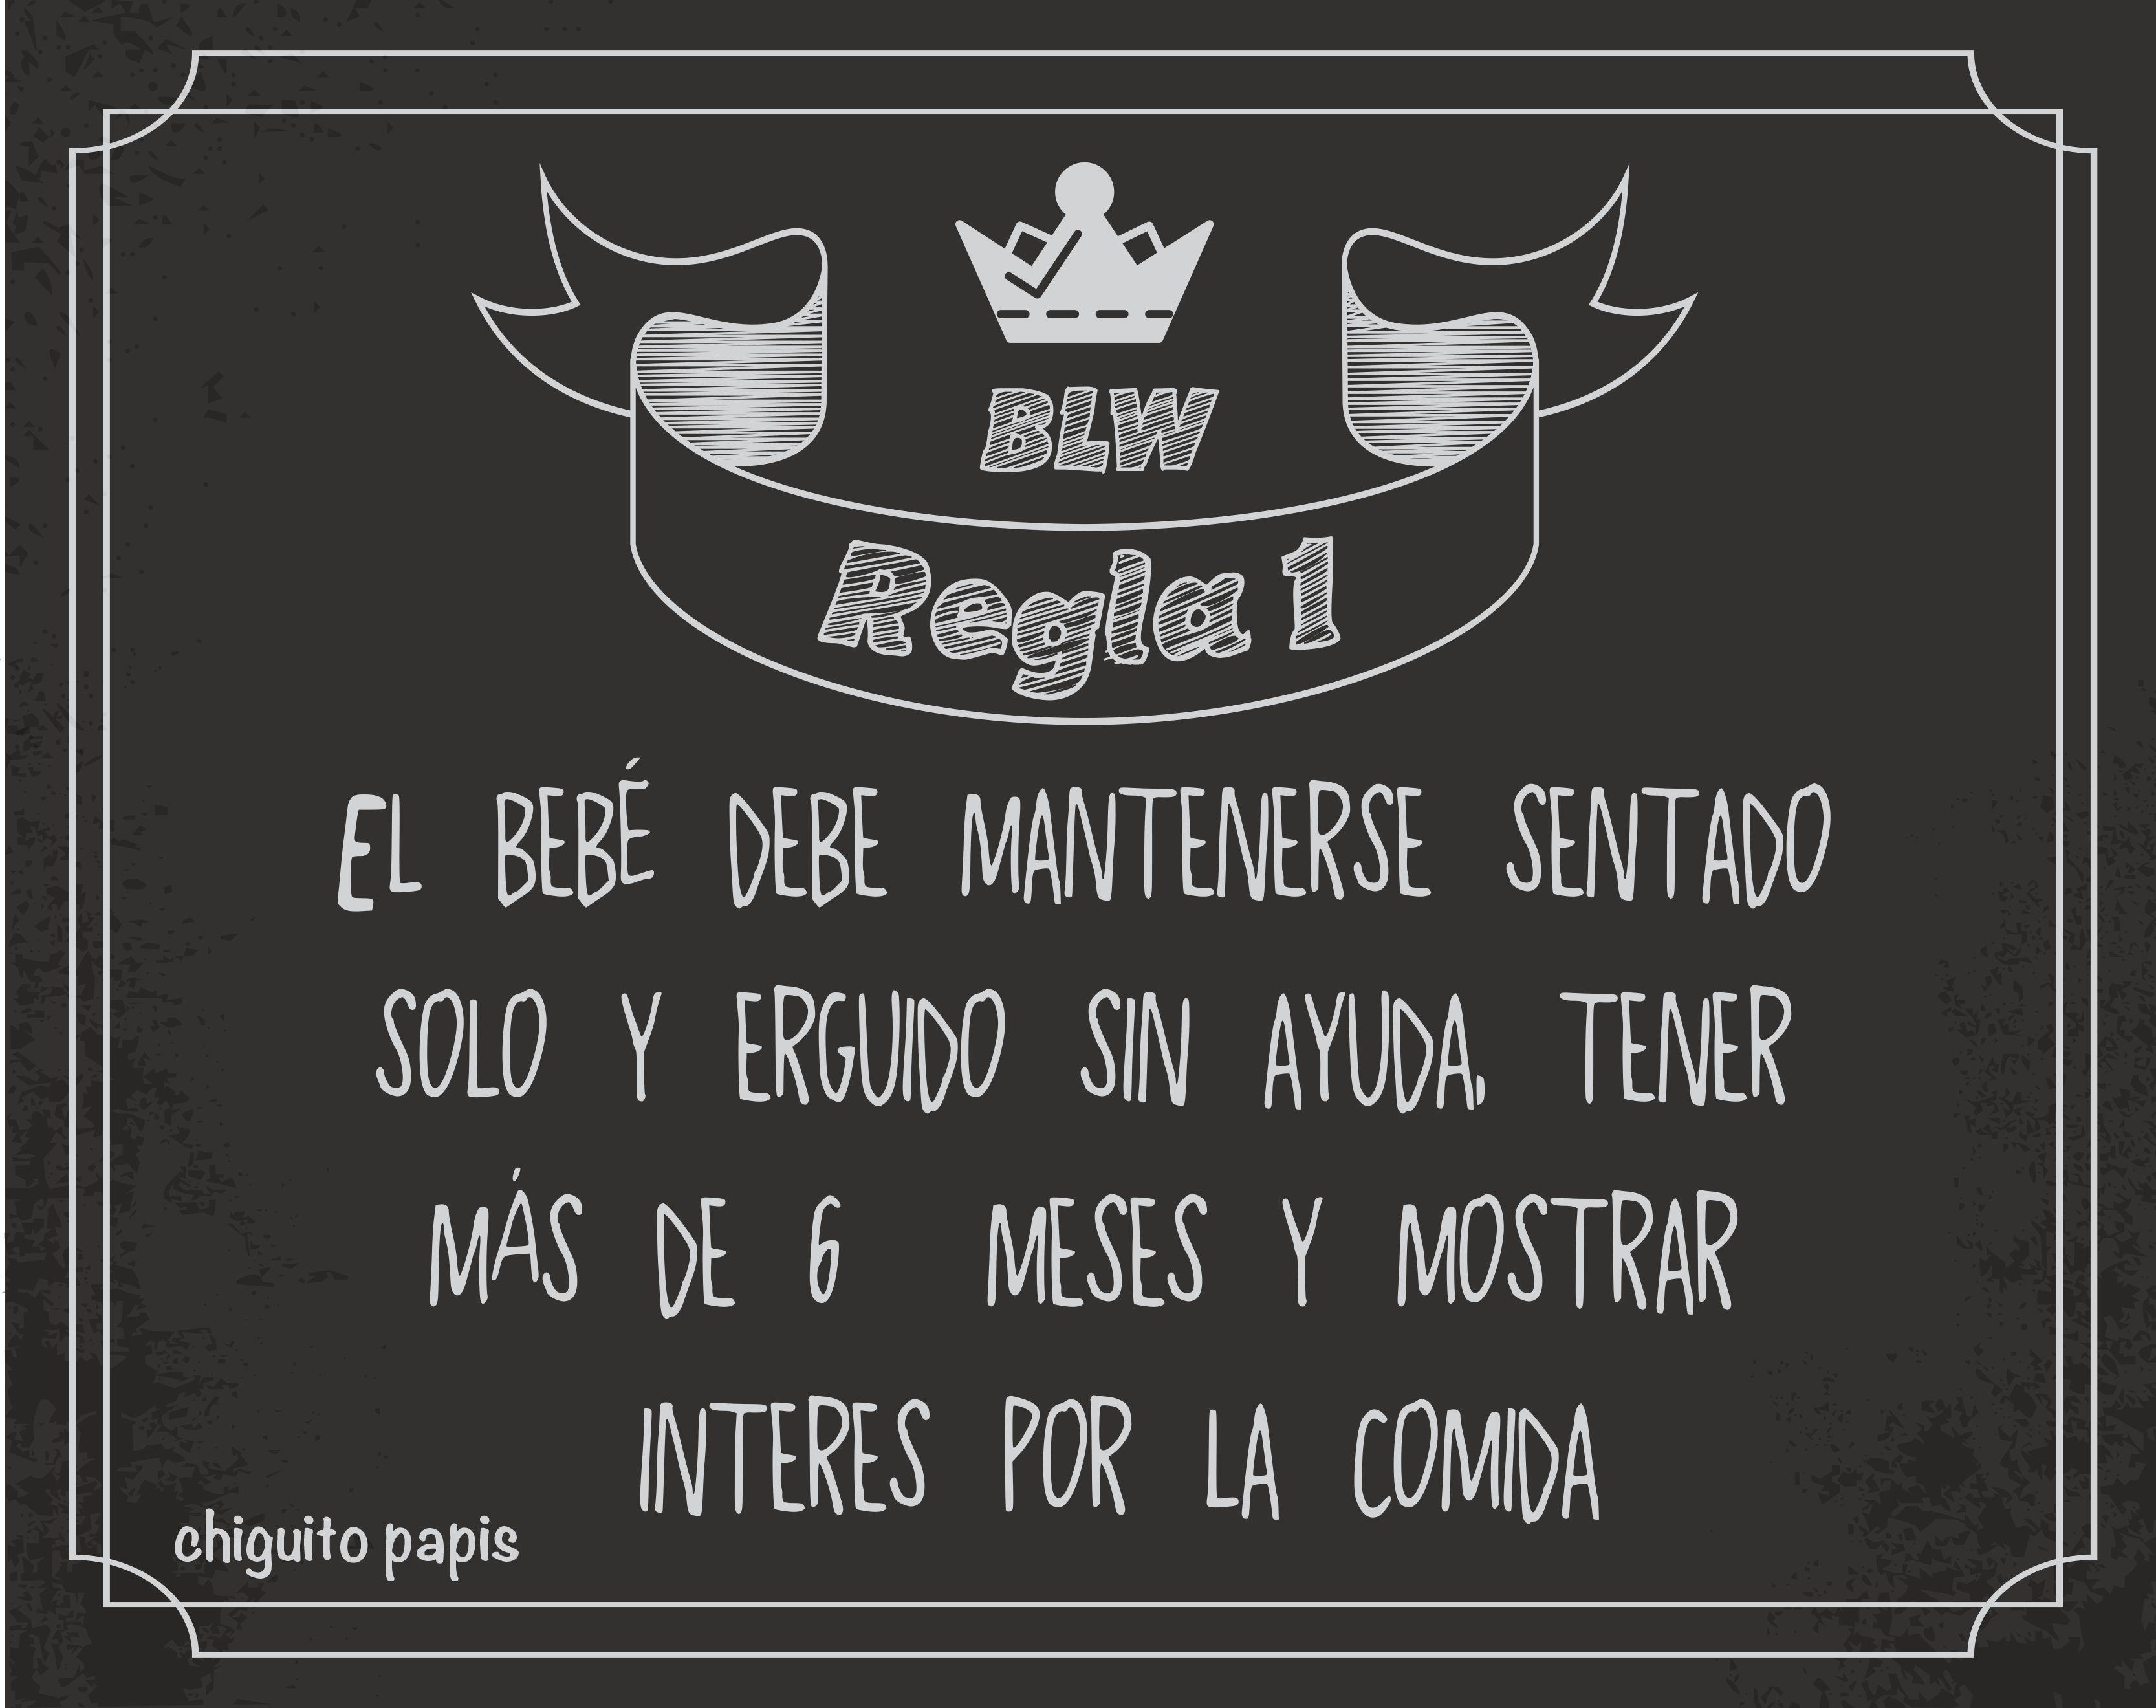 regla 1